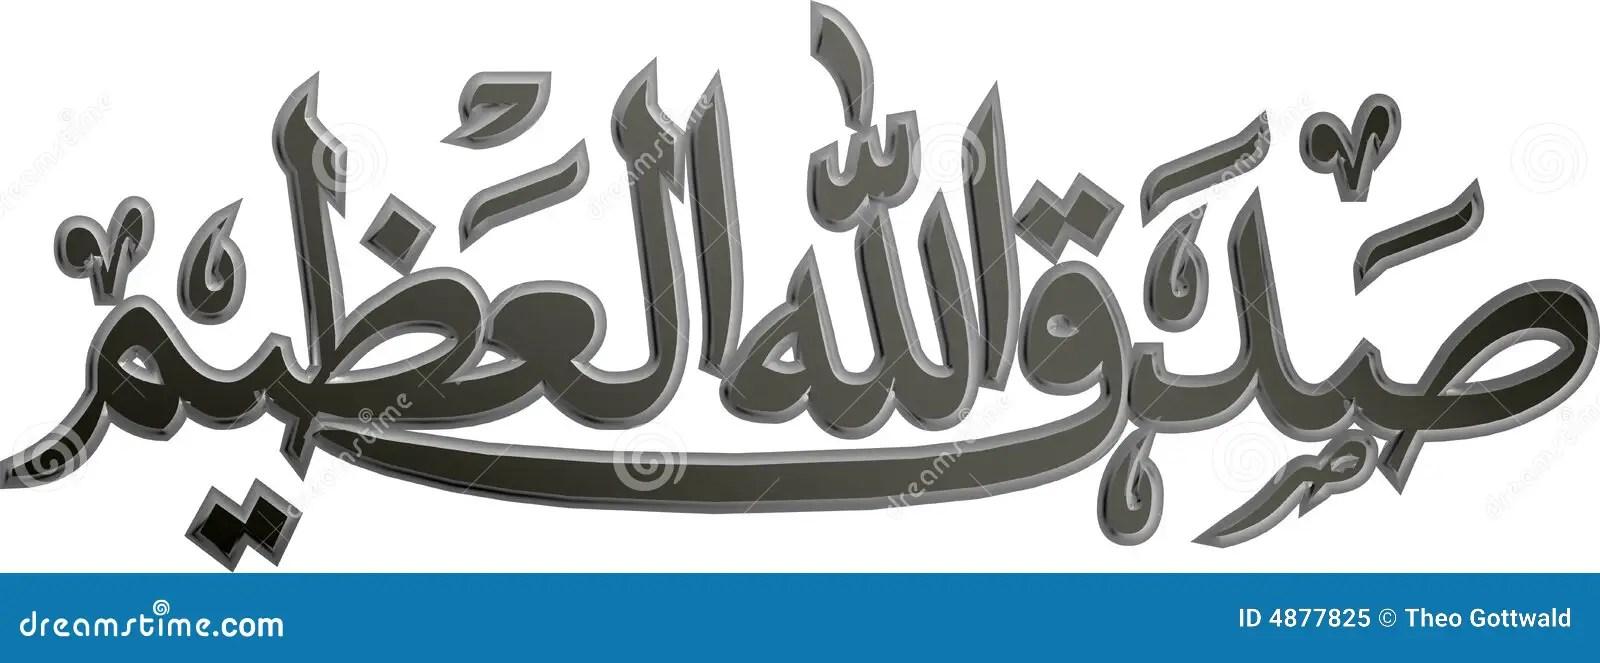 Islamic prayer symbol stock illustration. Illustration of